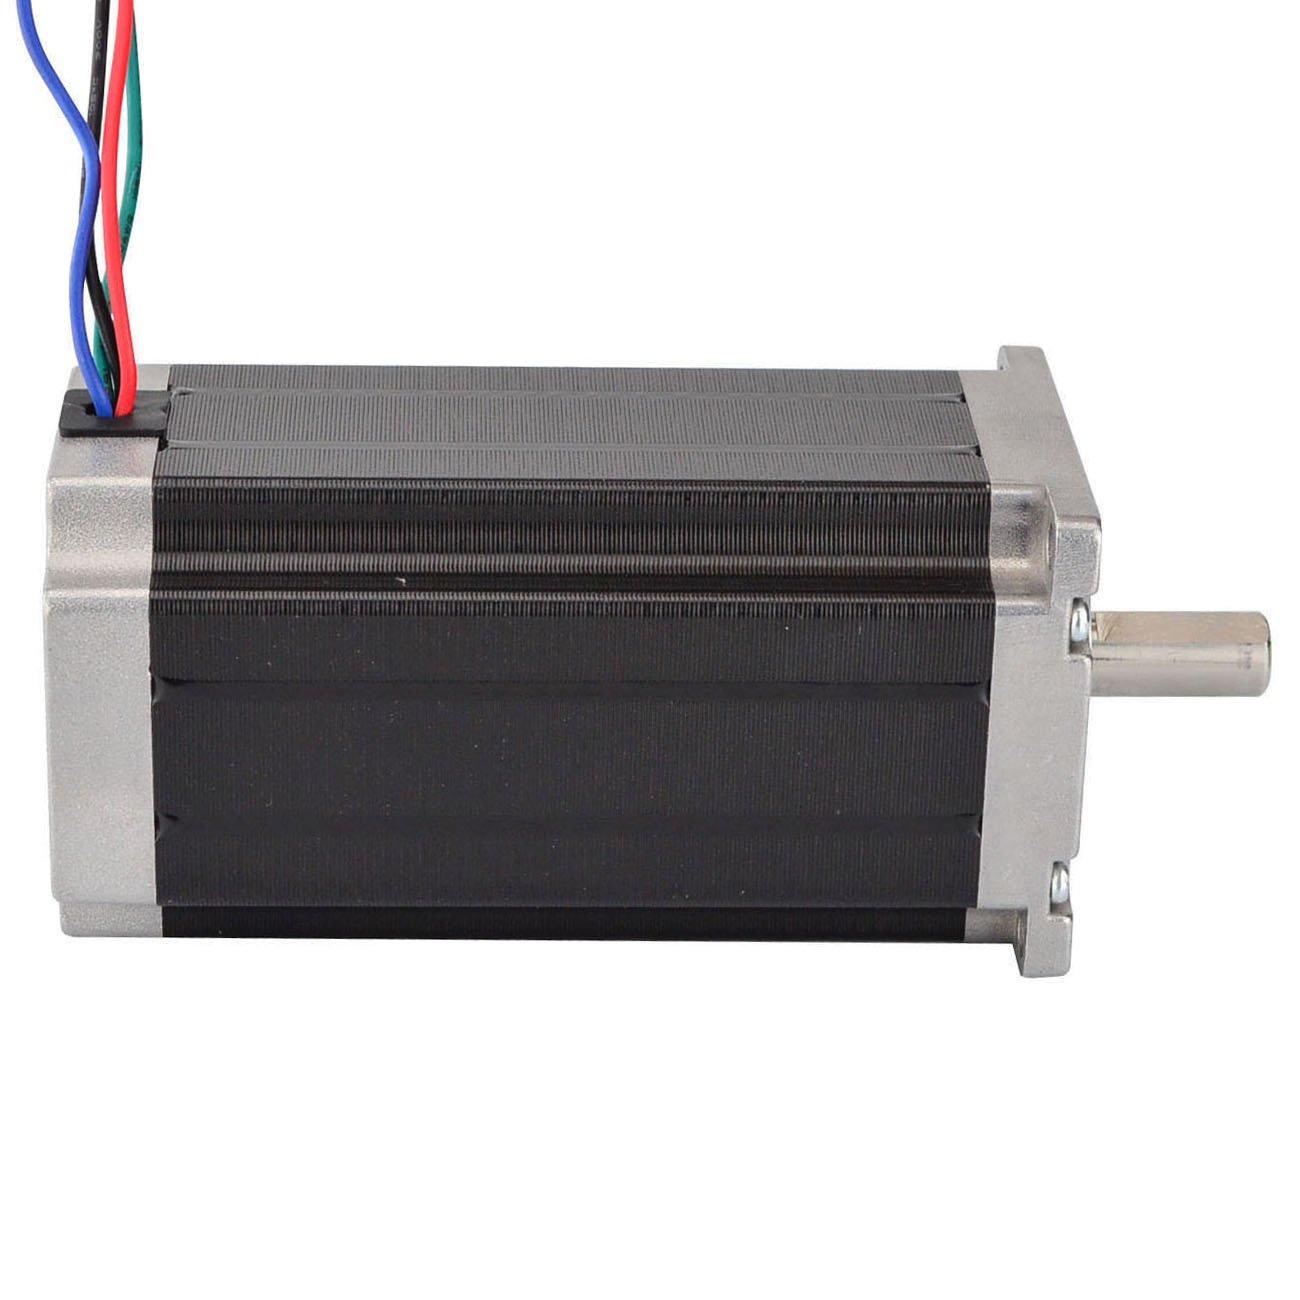 STEPPERONLINE Nema 23 Stepper Motor 3Nm 4.2A 4-Lead 10mm Shaft for CNC Mill Lathe Plasma Router